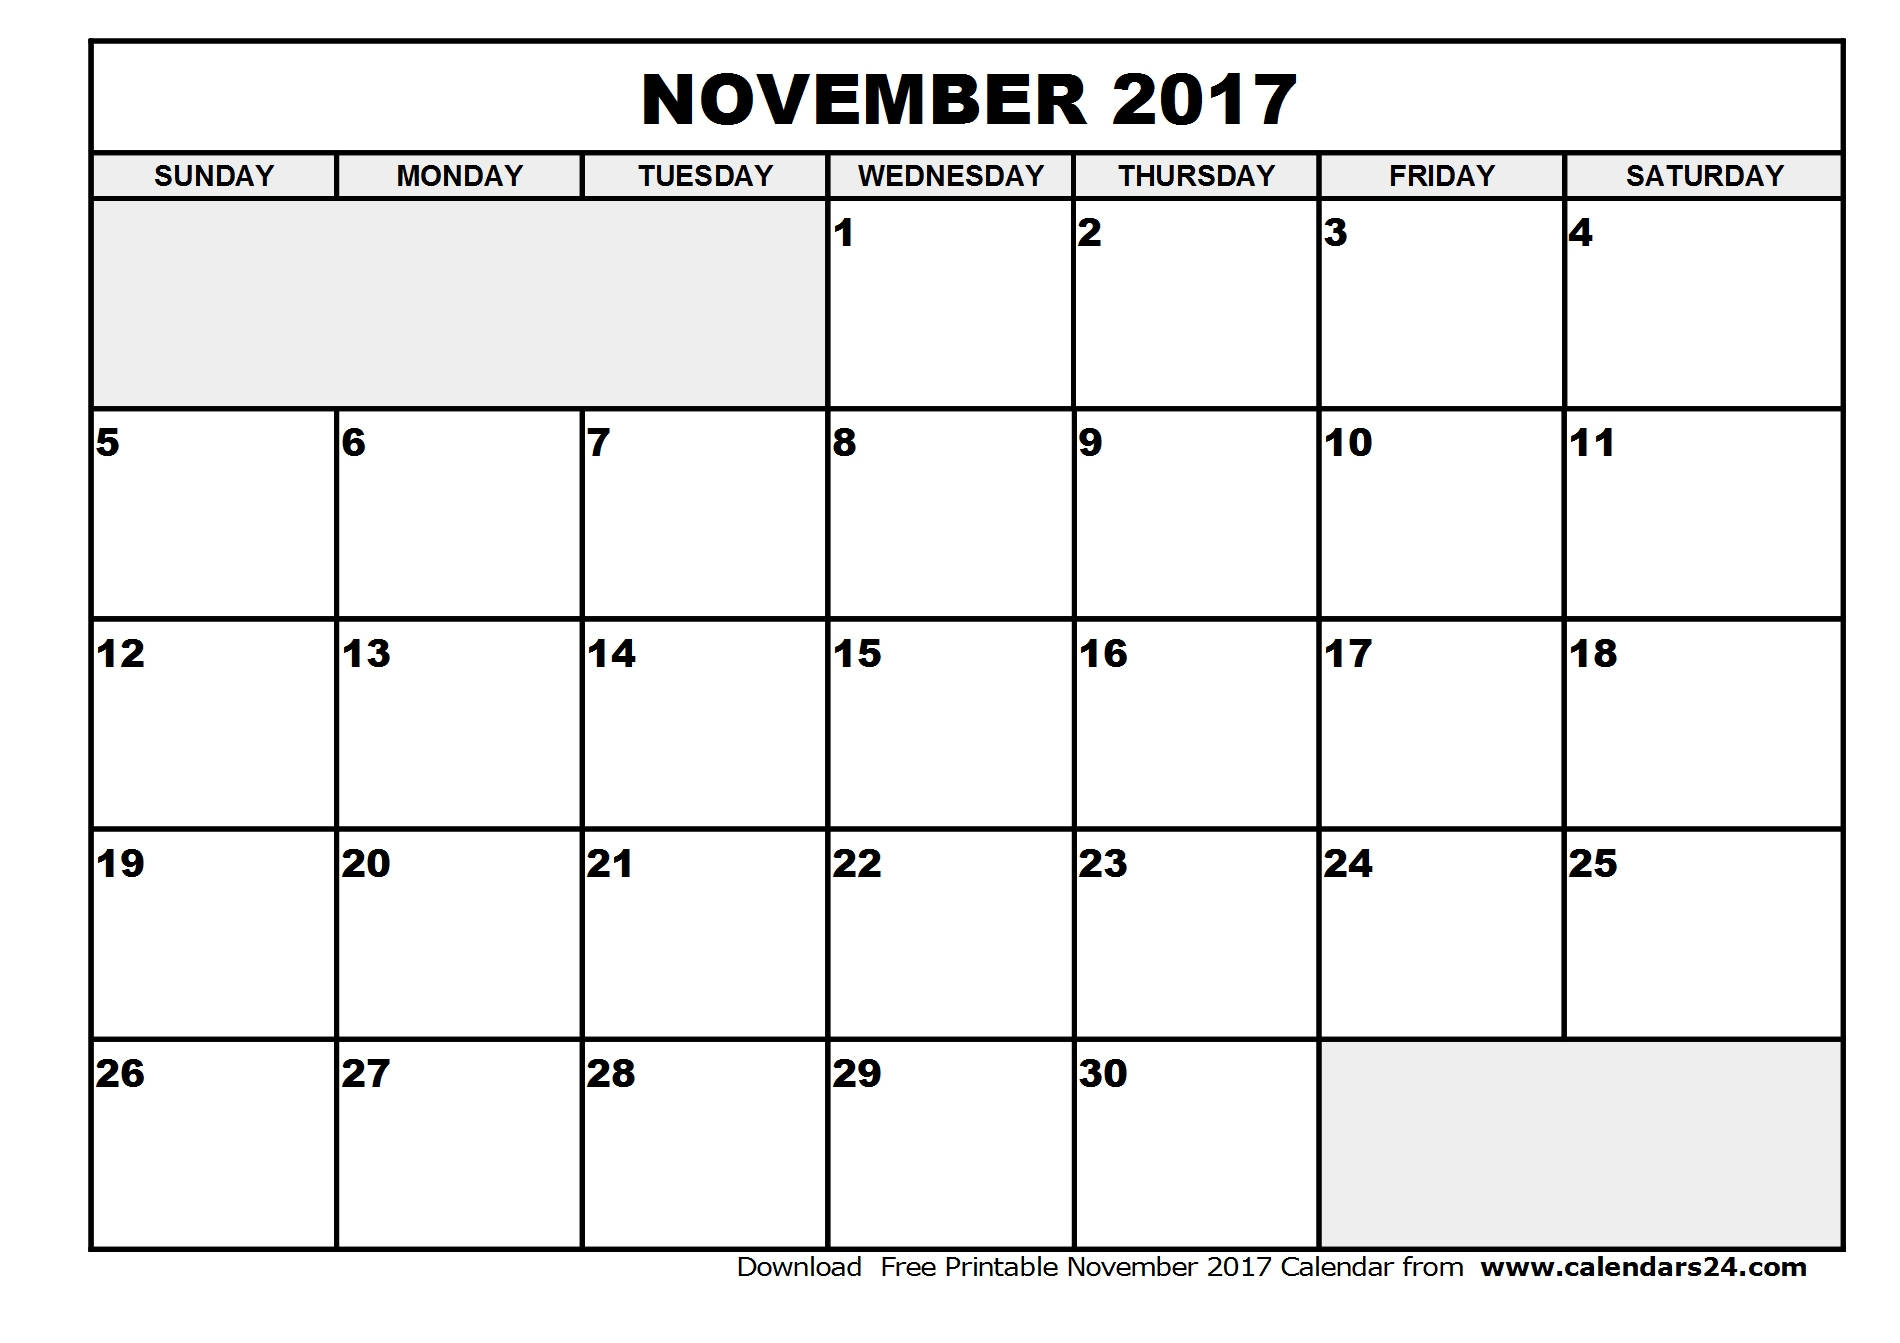 November 2017 Calendar & December 2017 Calendar